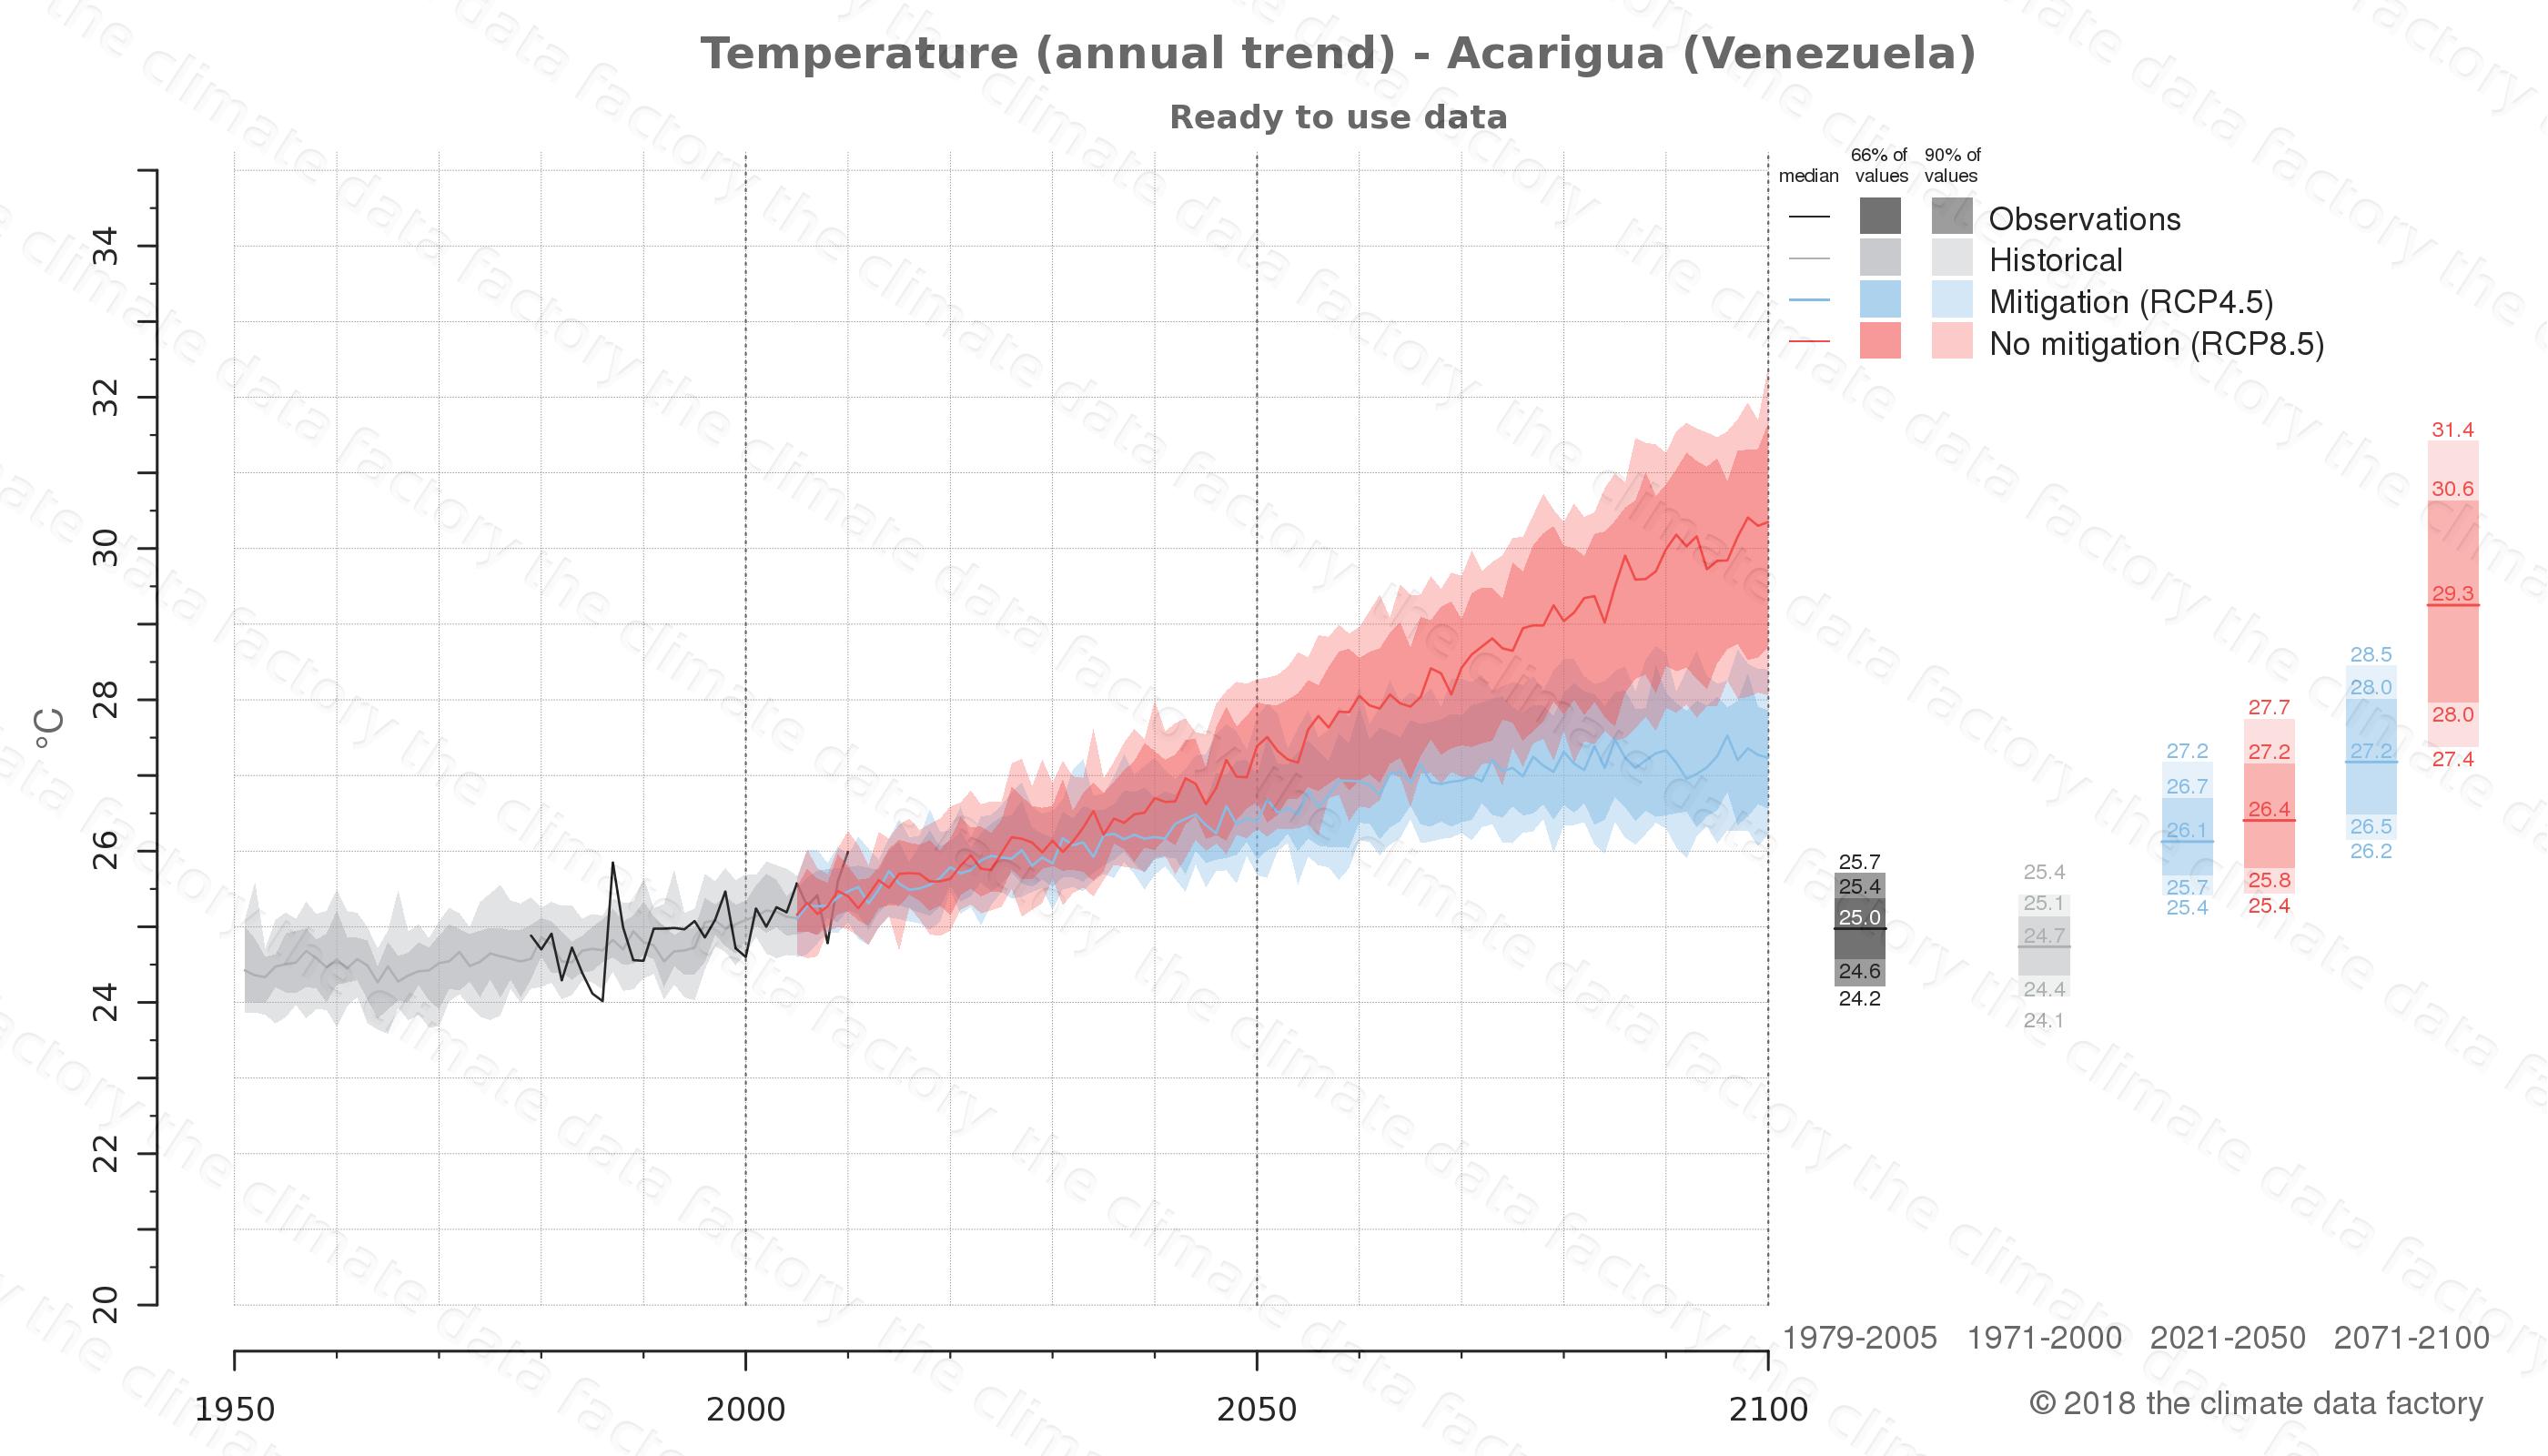 climate change data policy adaptation climate graph city data temperature acarigua venezuela